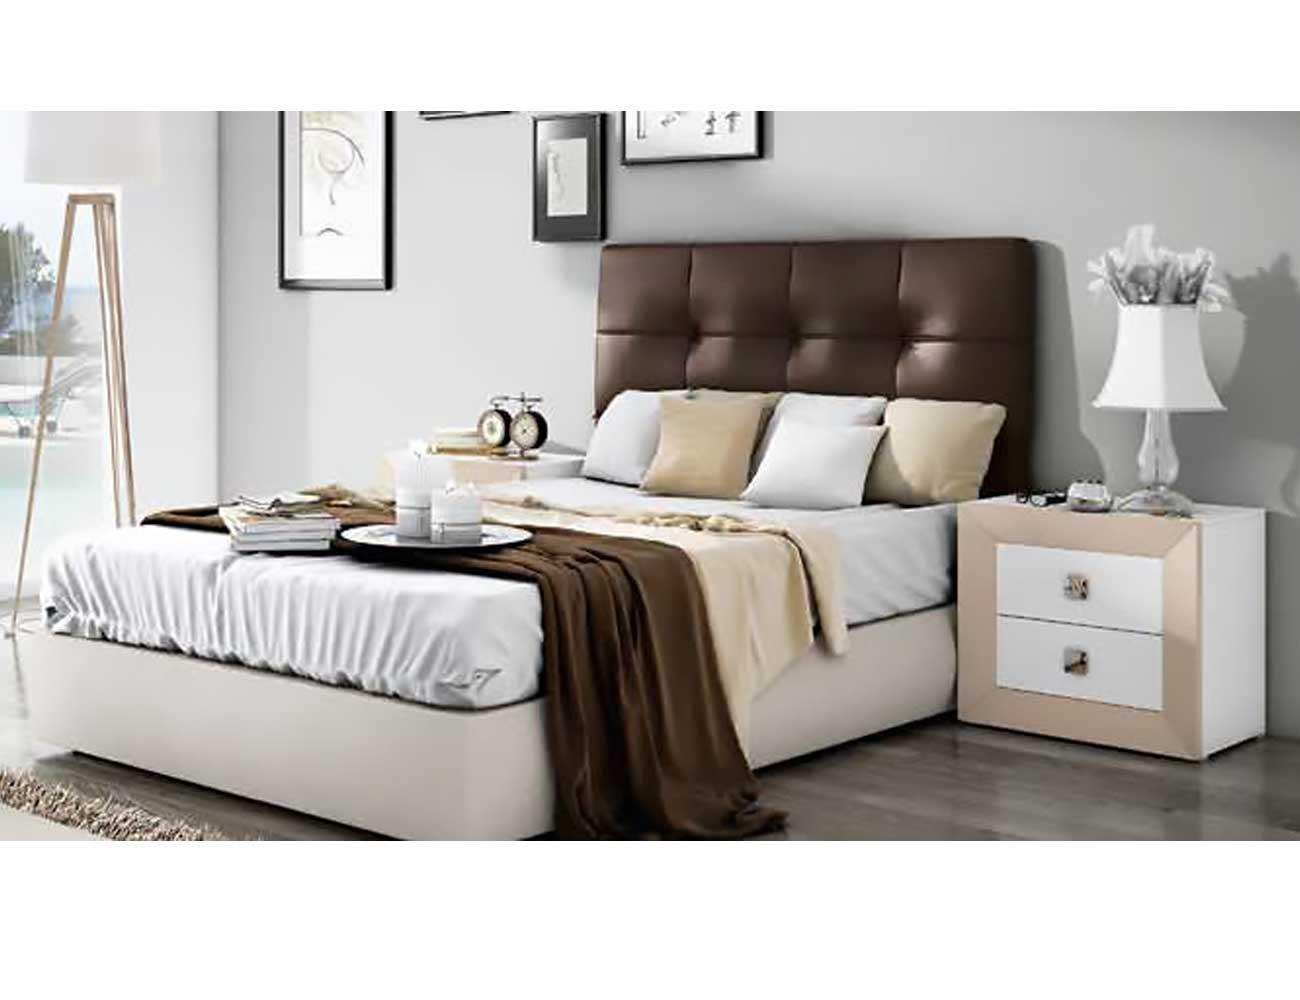 Dormitorio matrimonio moderno blanco vison polipiel chocolate 08